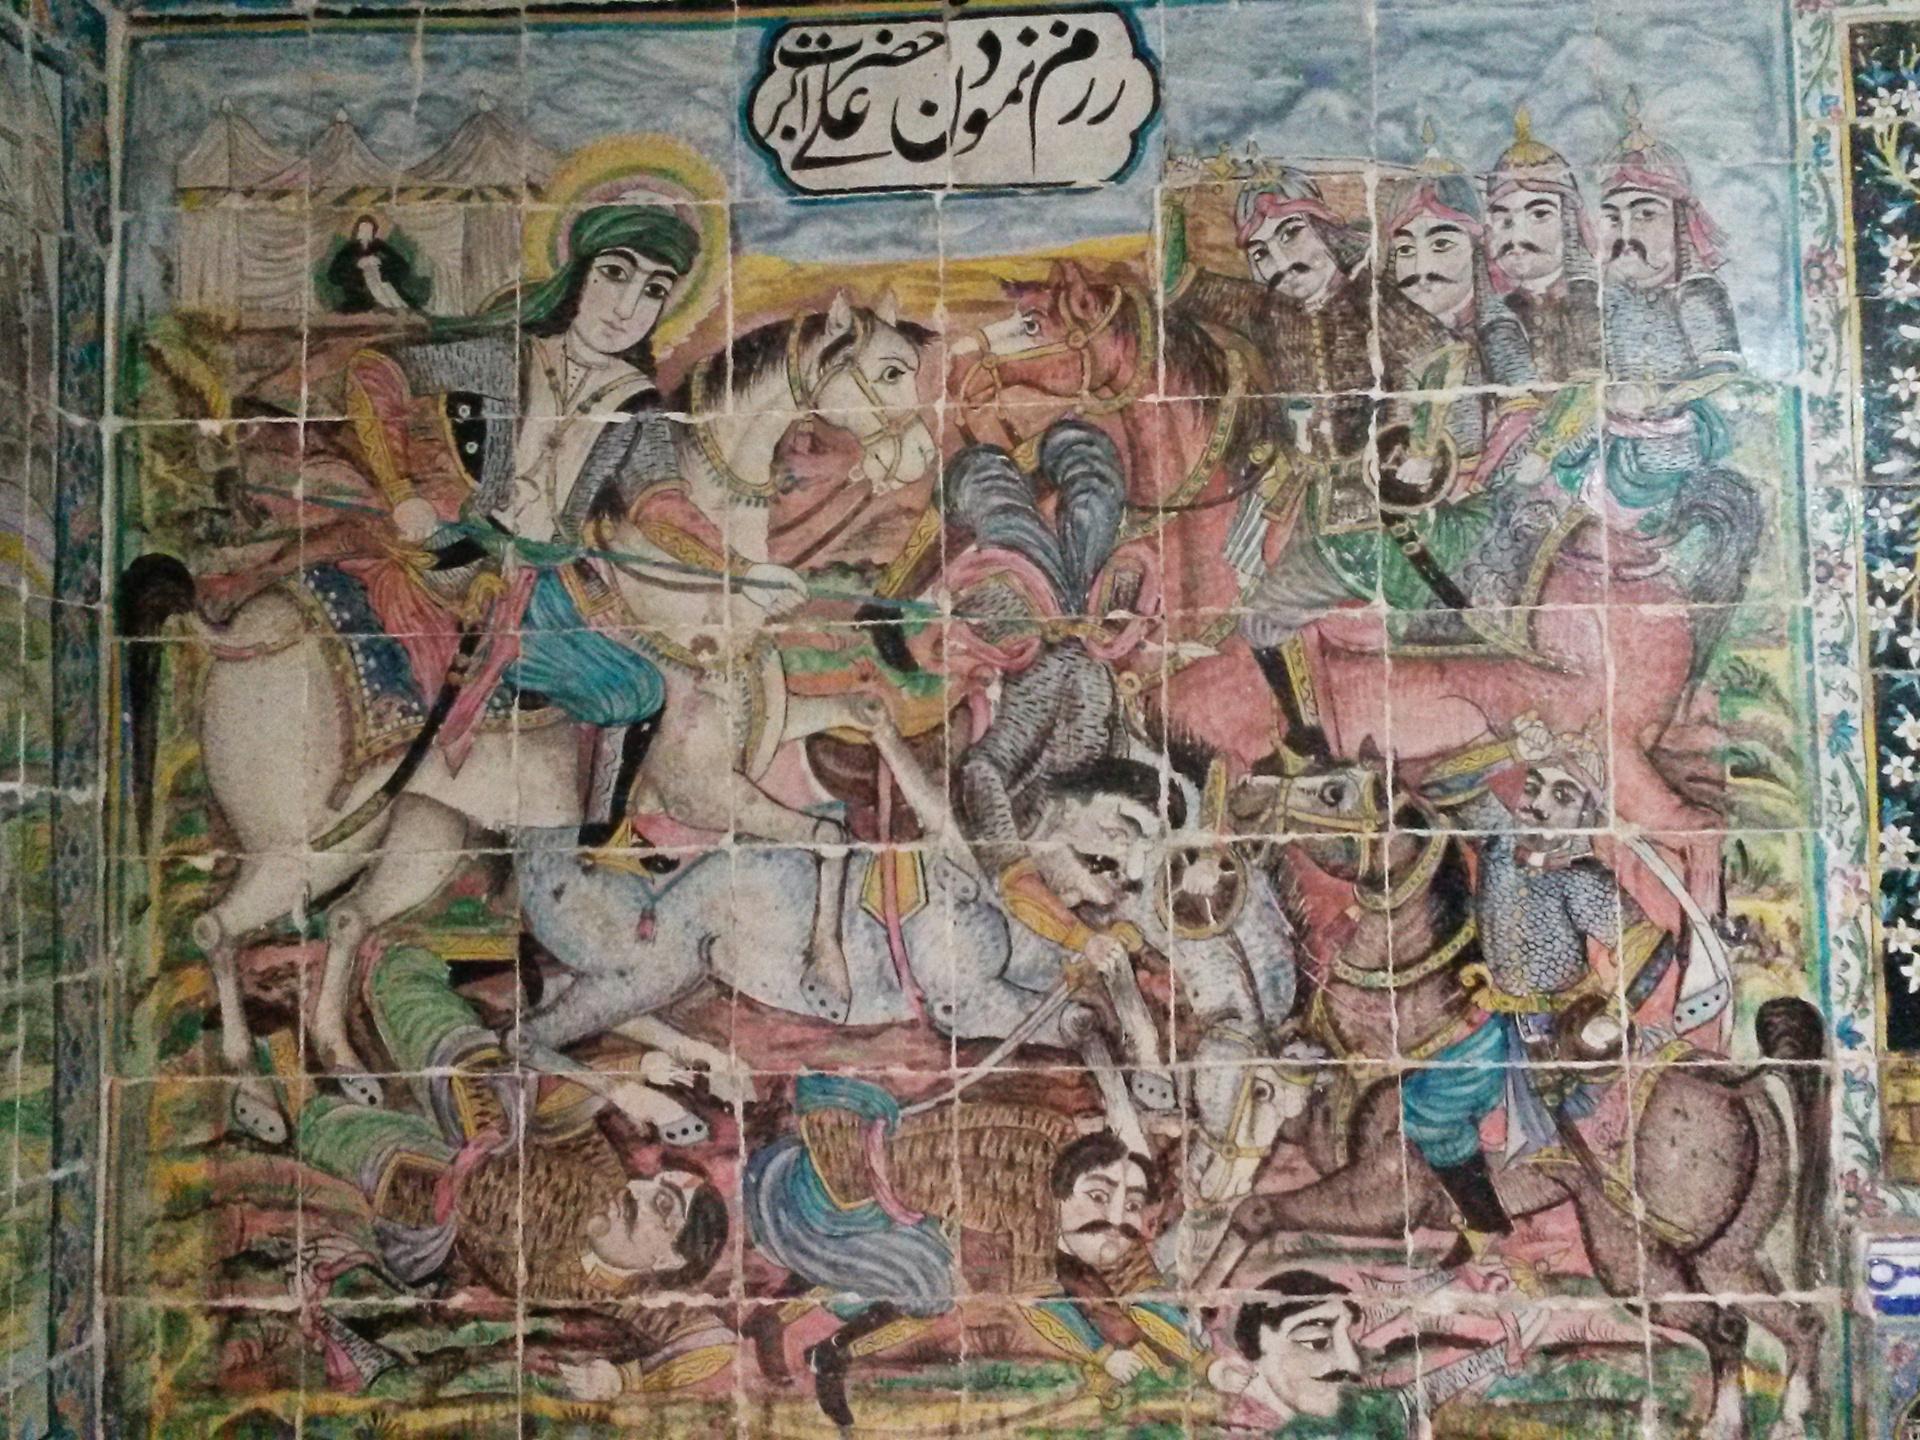 "Darstellung in einer <em>ḥoseiniyeh</em> in Kermanshah, Iran.<br> Foto: <a href=""/autor/olmo-goelz/"">Olmo Gölz</a><br> Lizenz: <a href=""https://creativecommons.org/licenses/by-nd/4.0/deed.de"">Creative Commons BY-ND 4.0</a>"